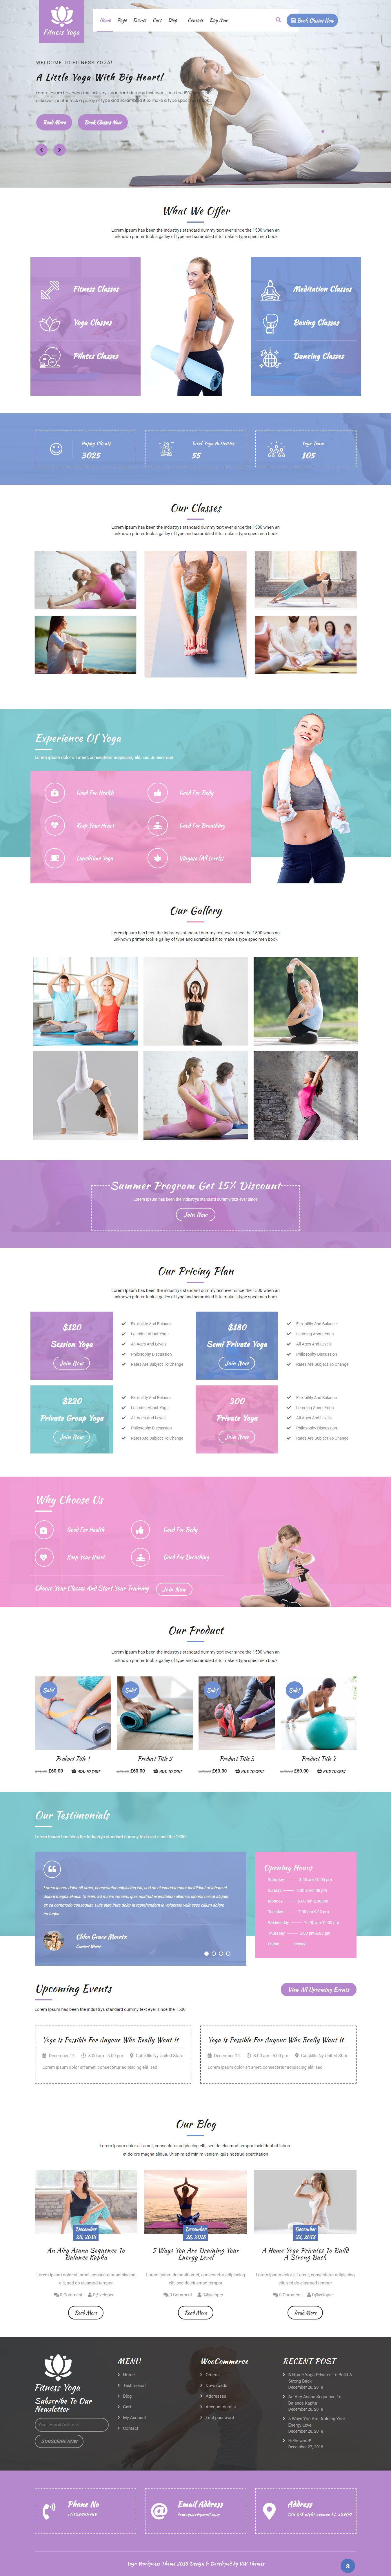 VW Yoga Fitness - El mejor tema de WordPress de estilo de vida gratuito